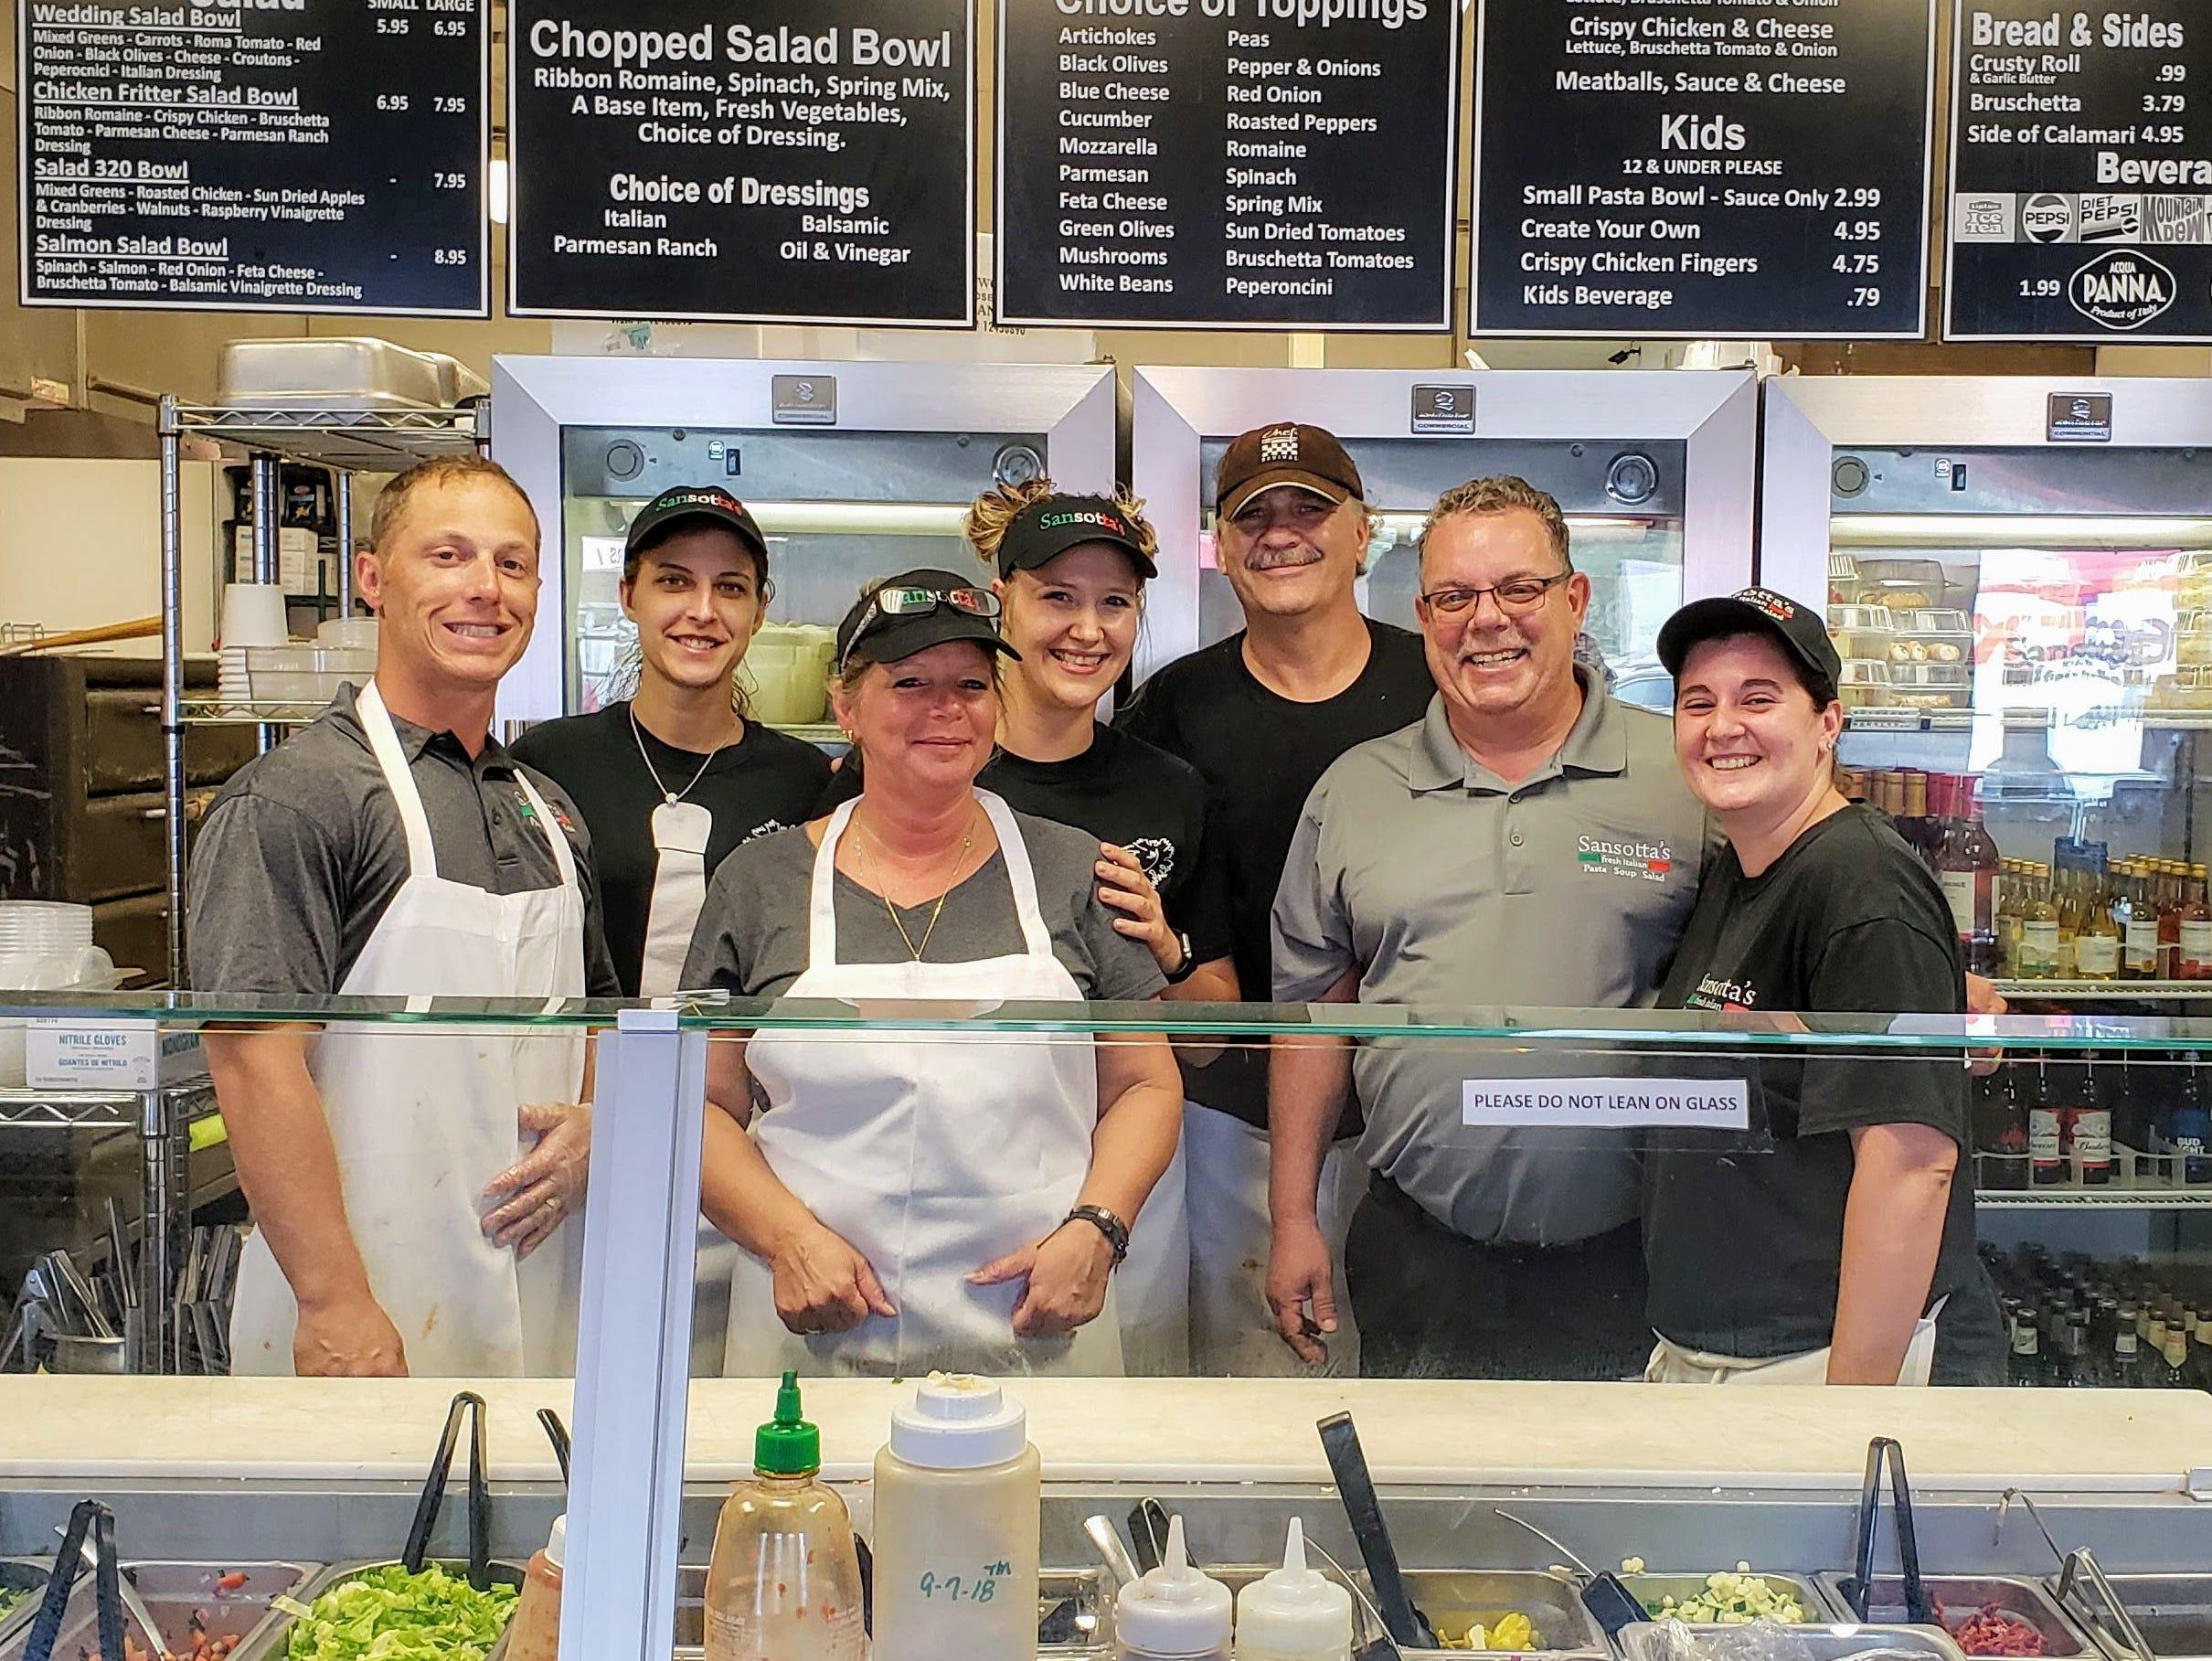 Staff of Sansotta's. Left to right are Ralph Cirillo III, Brandy Thomas, Tami McKinniss, Renee Wilde, Bob Eckard, Joe Sansotta and Tesla Koeppel.